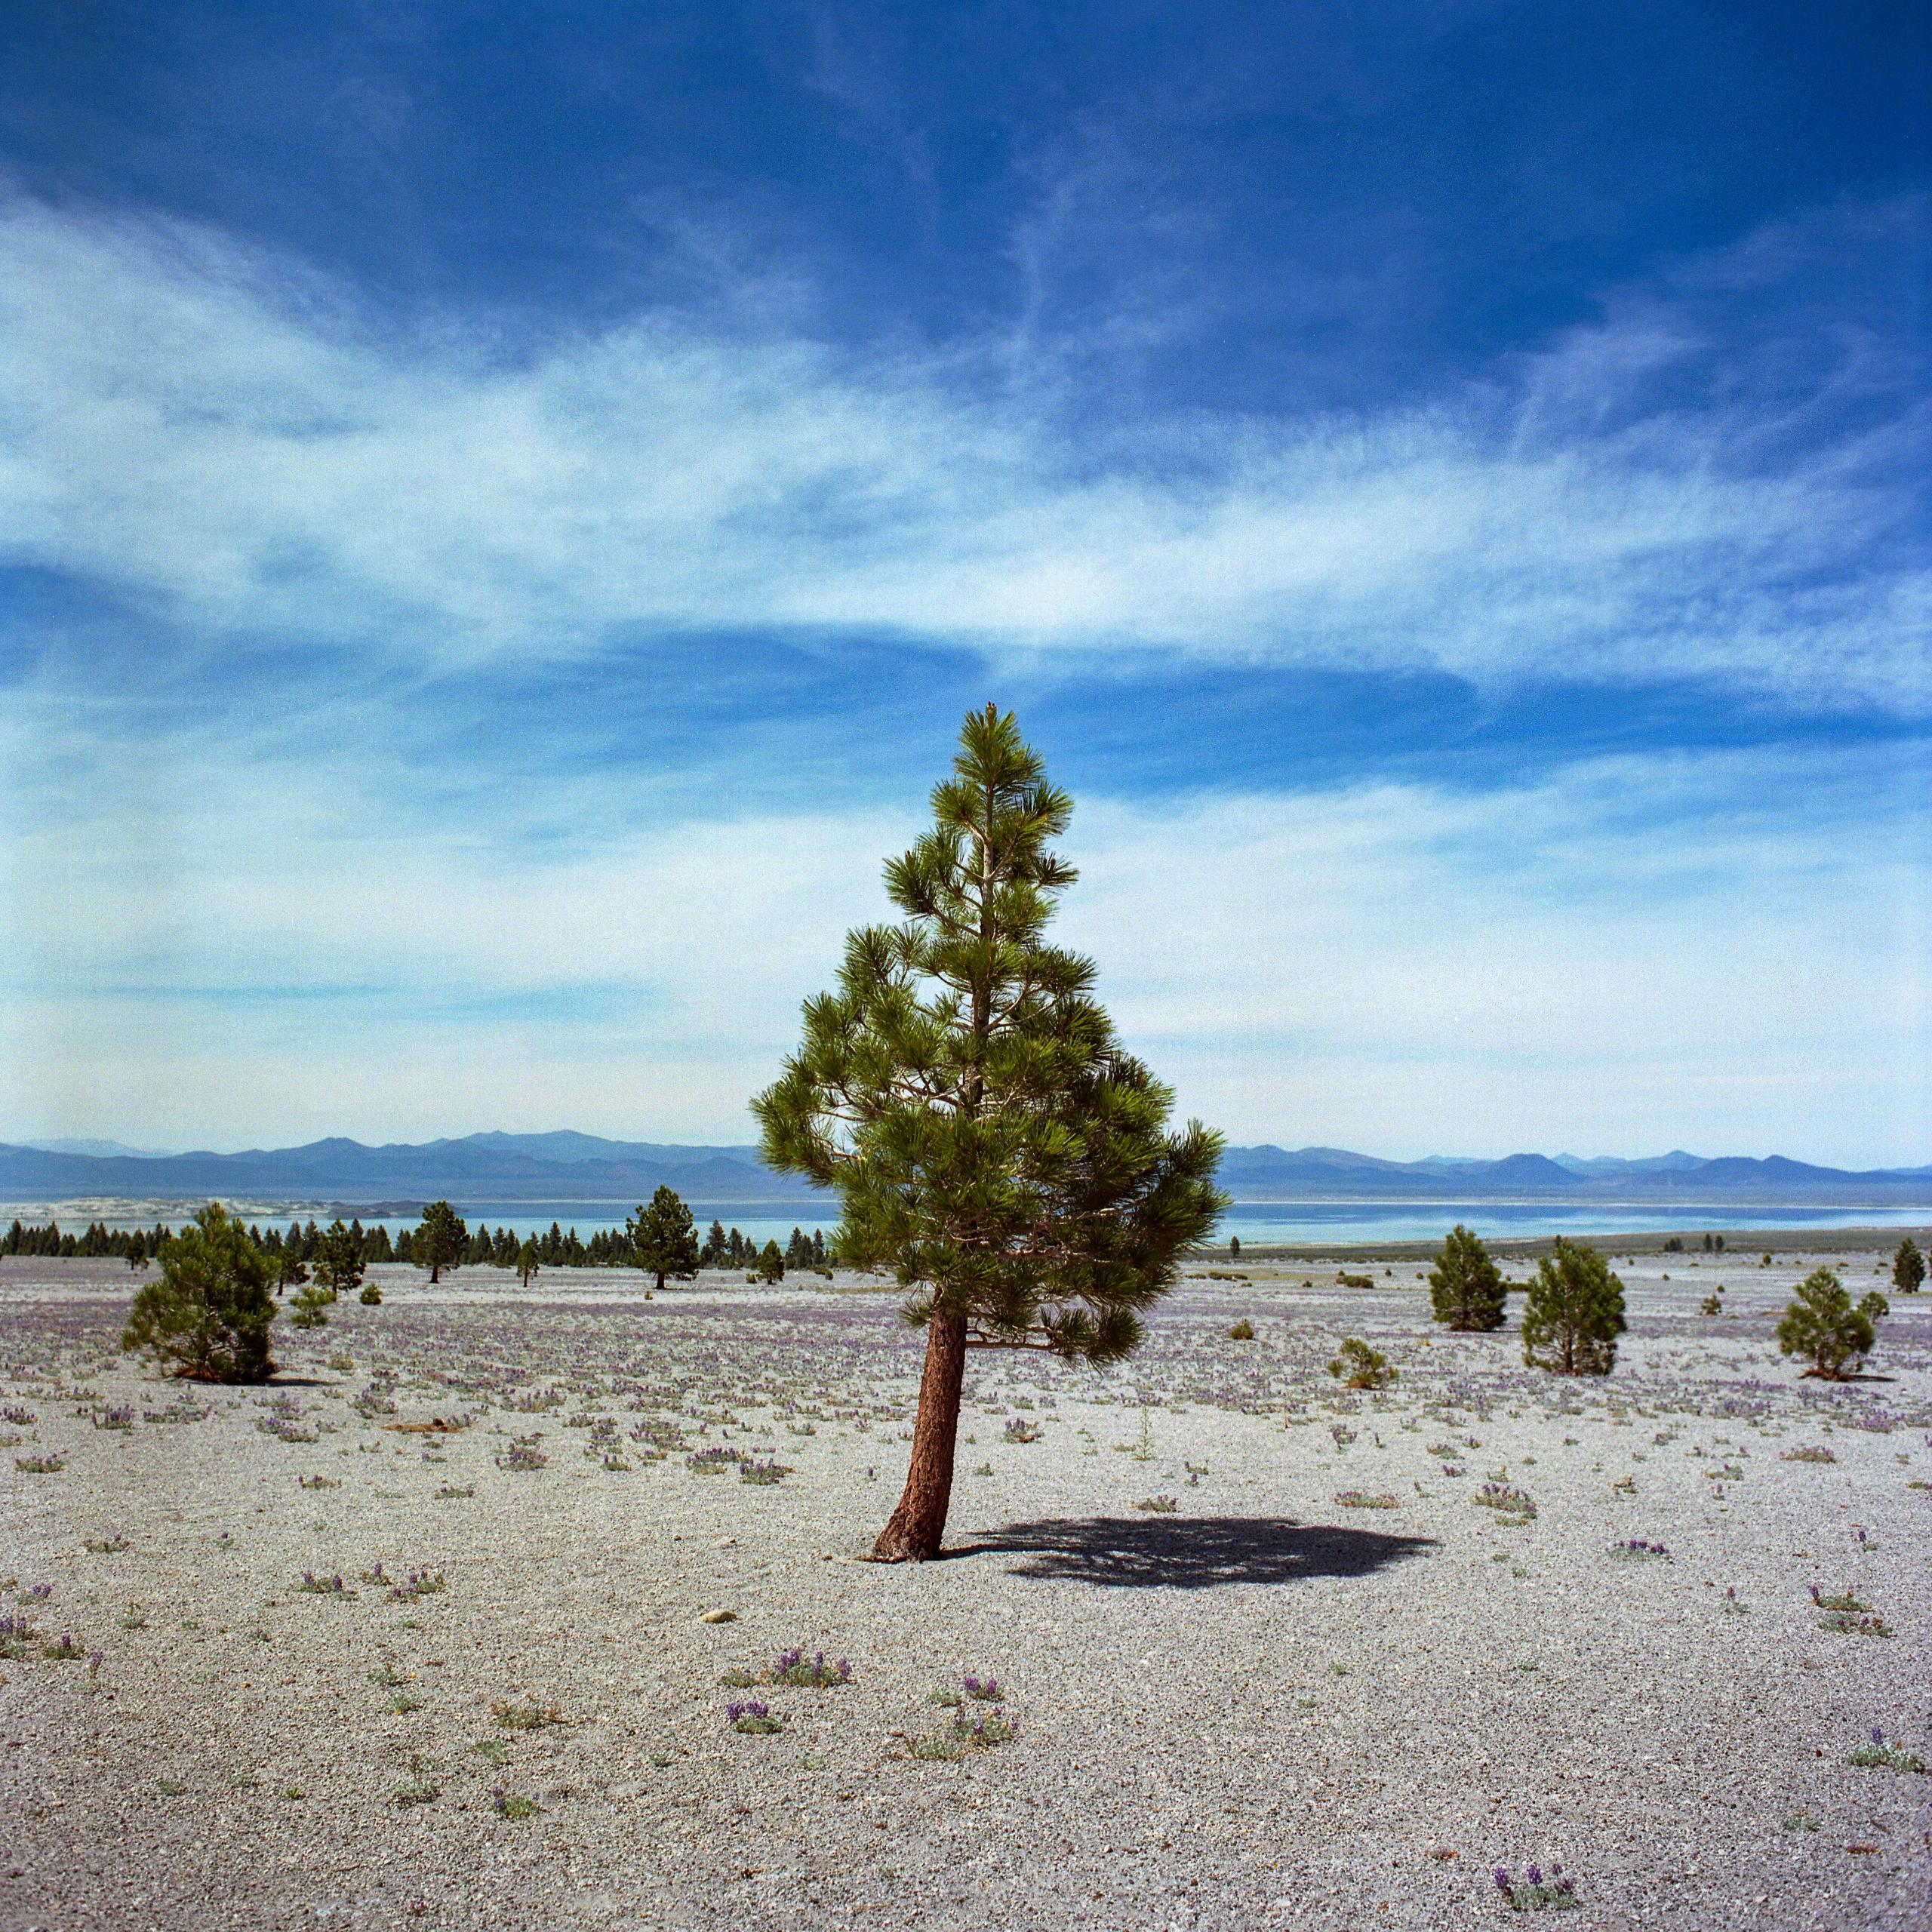 Mono Lake Mamiya C330 Kodak Ekt - danielregner | ello